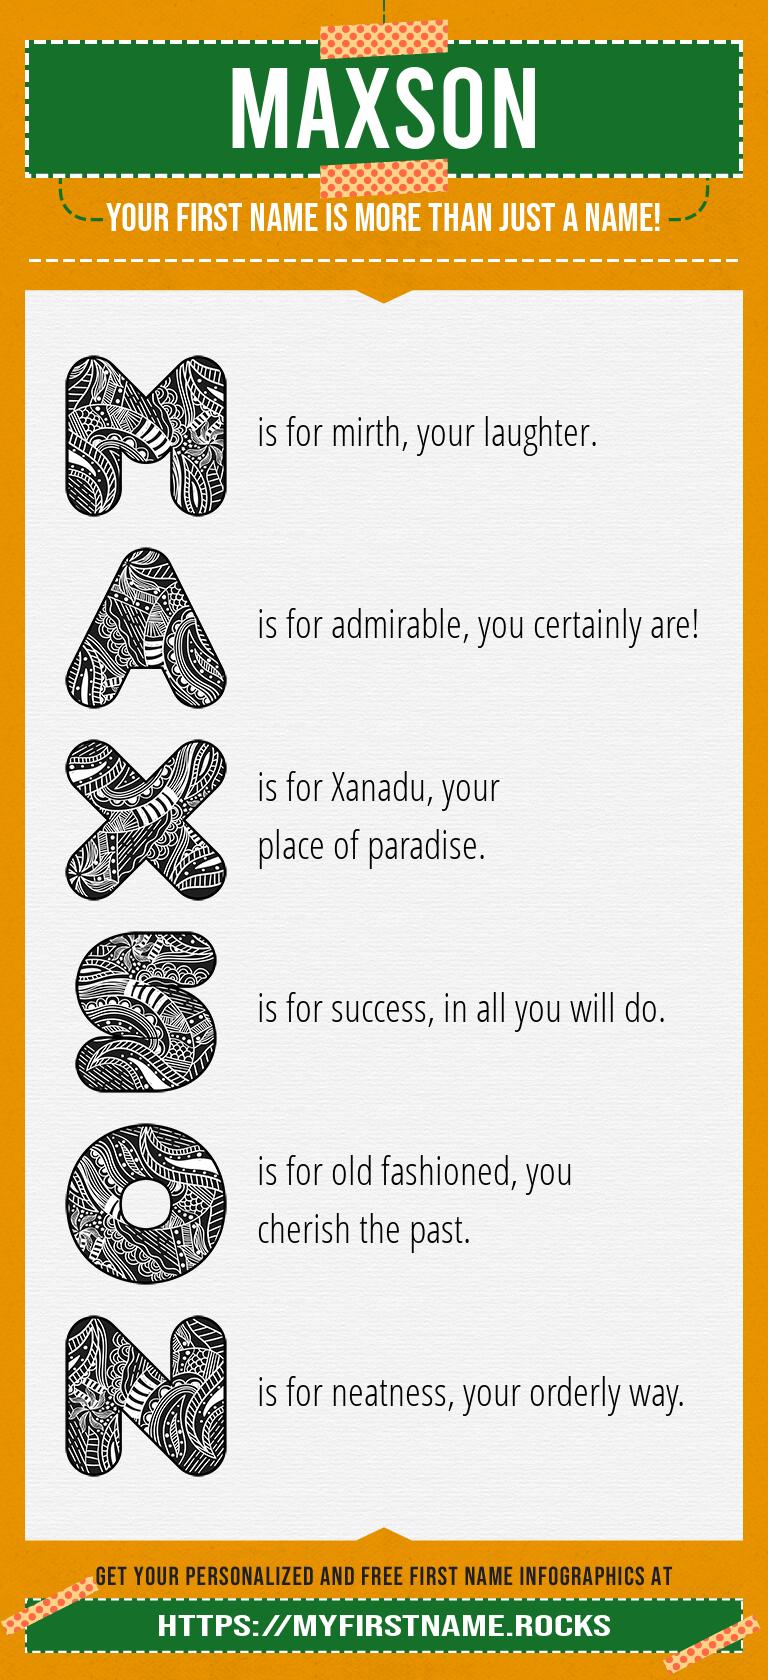 Maxson Infographics